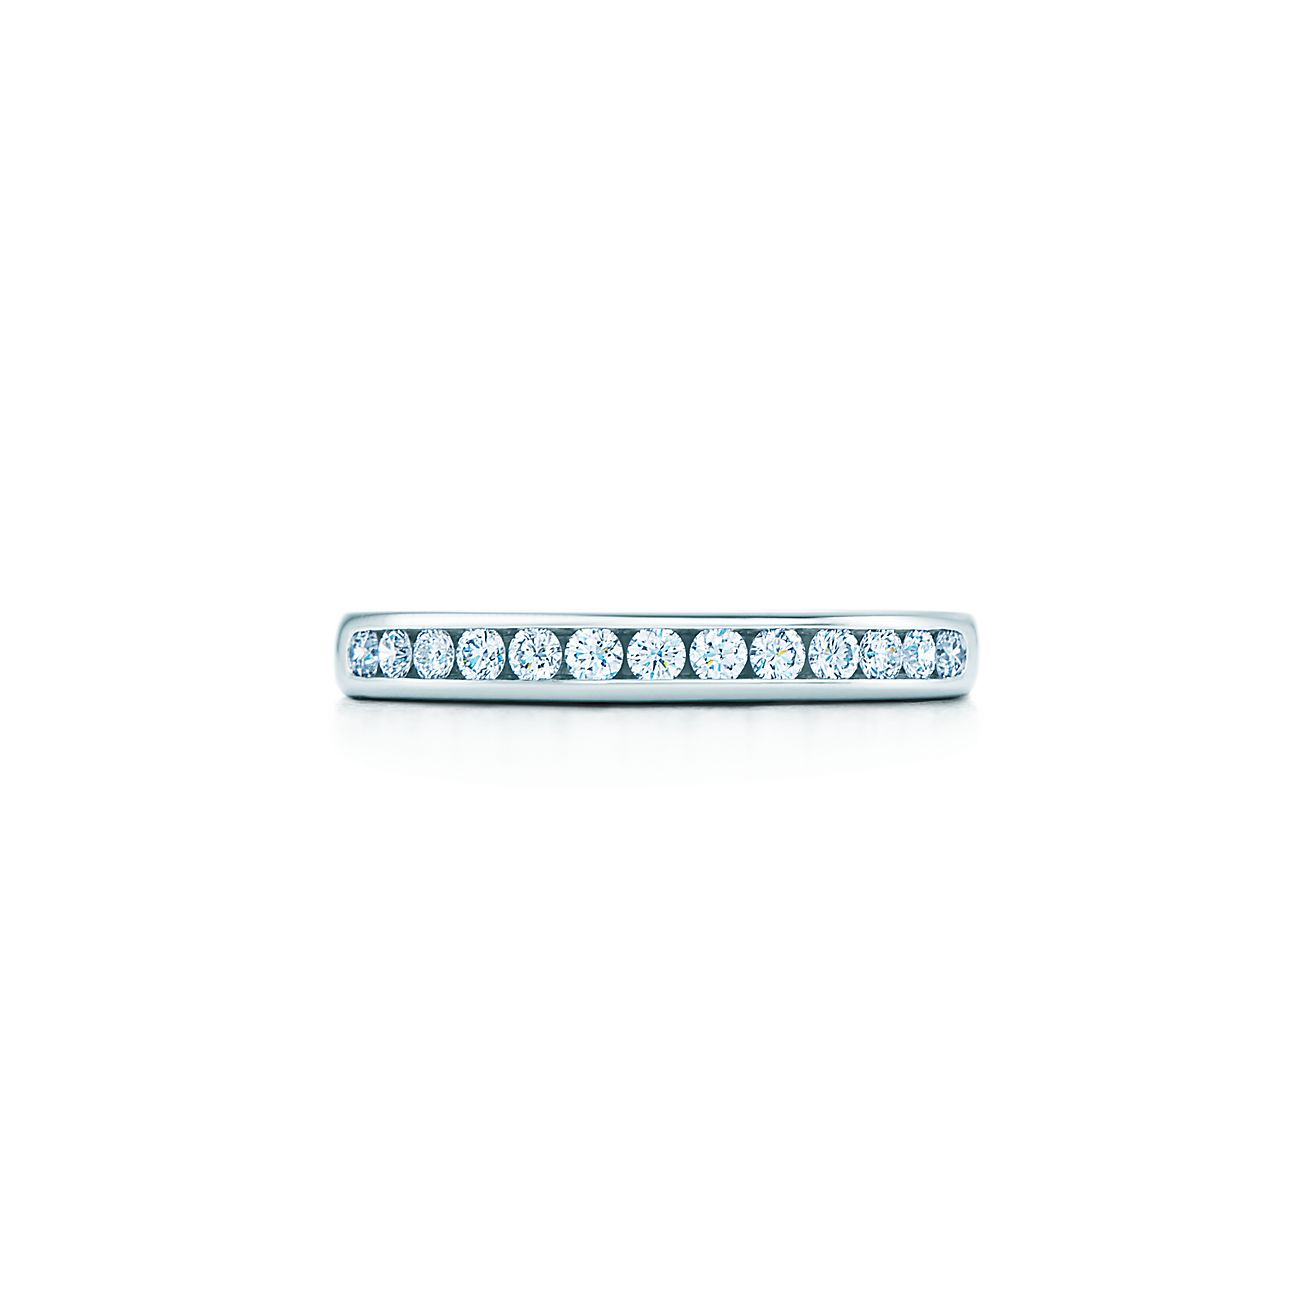 Tiffany diamond wedding band ring in platinum with a half circle tiffany diamond wedding band junglespirit Images